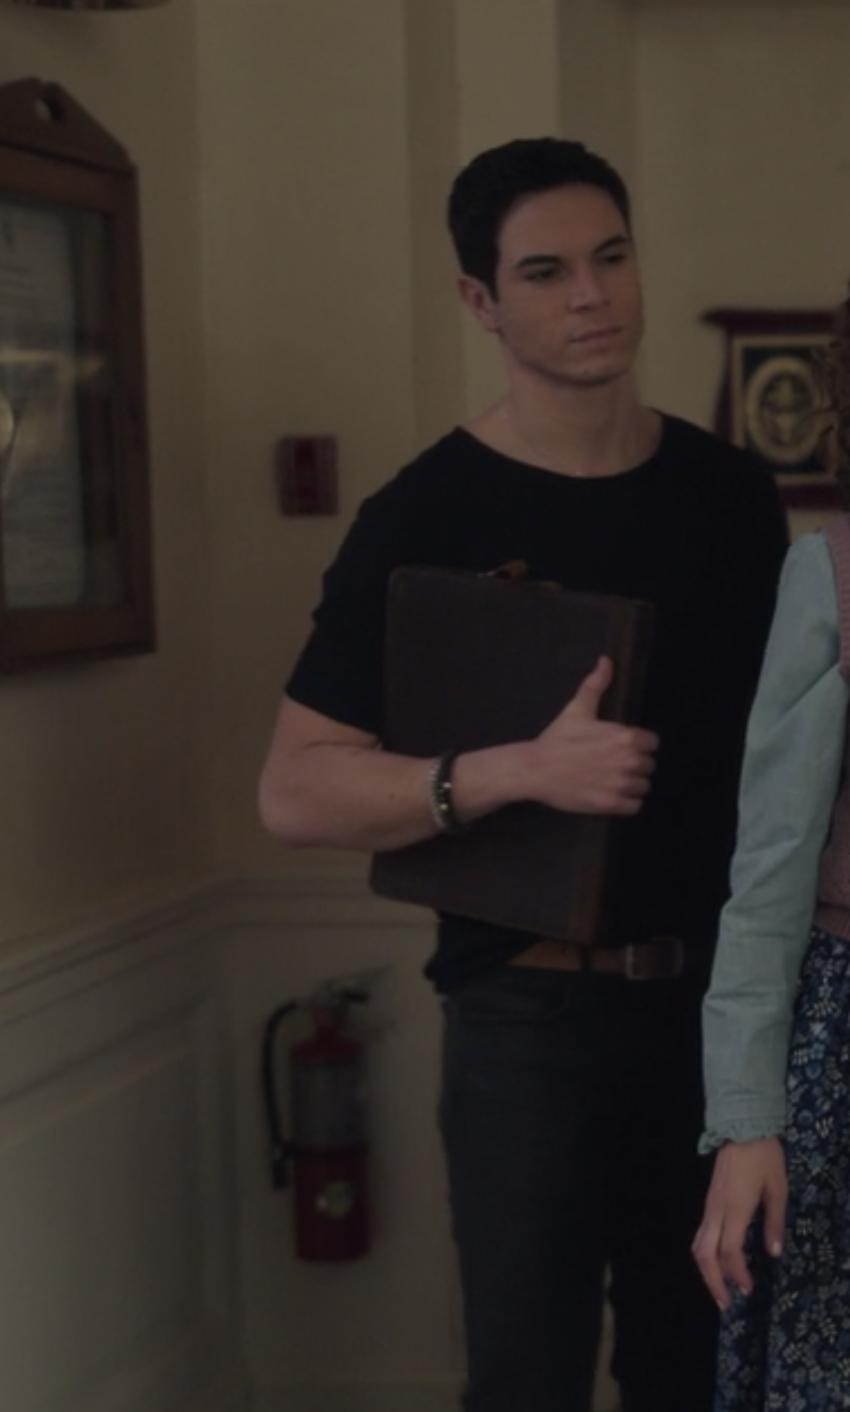 Jason Gotay in a tee shirt and jeans as Rafa Caparros